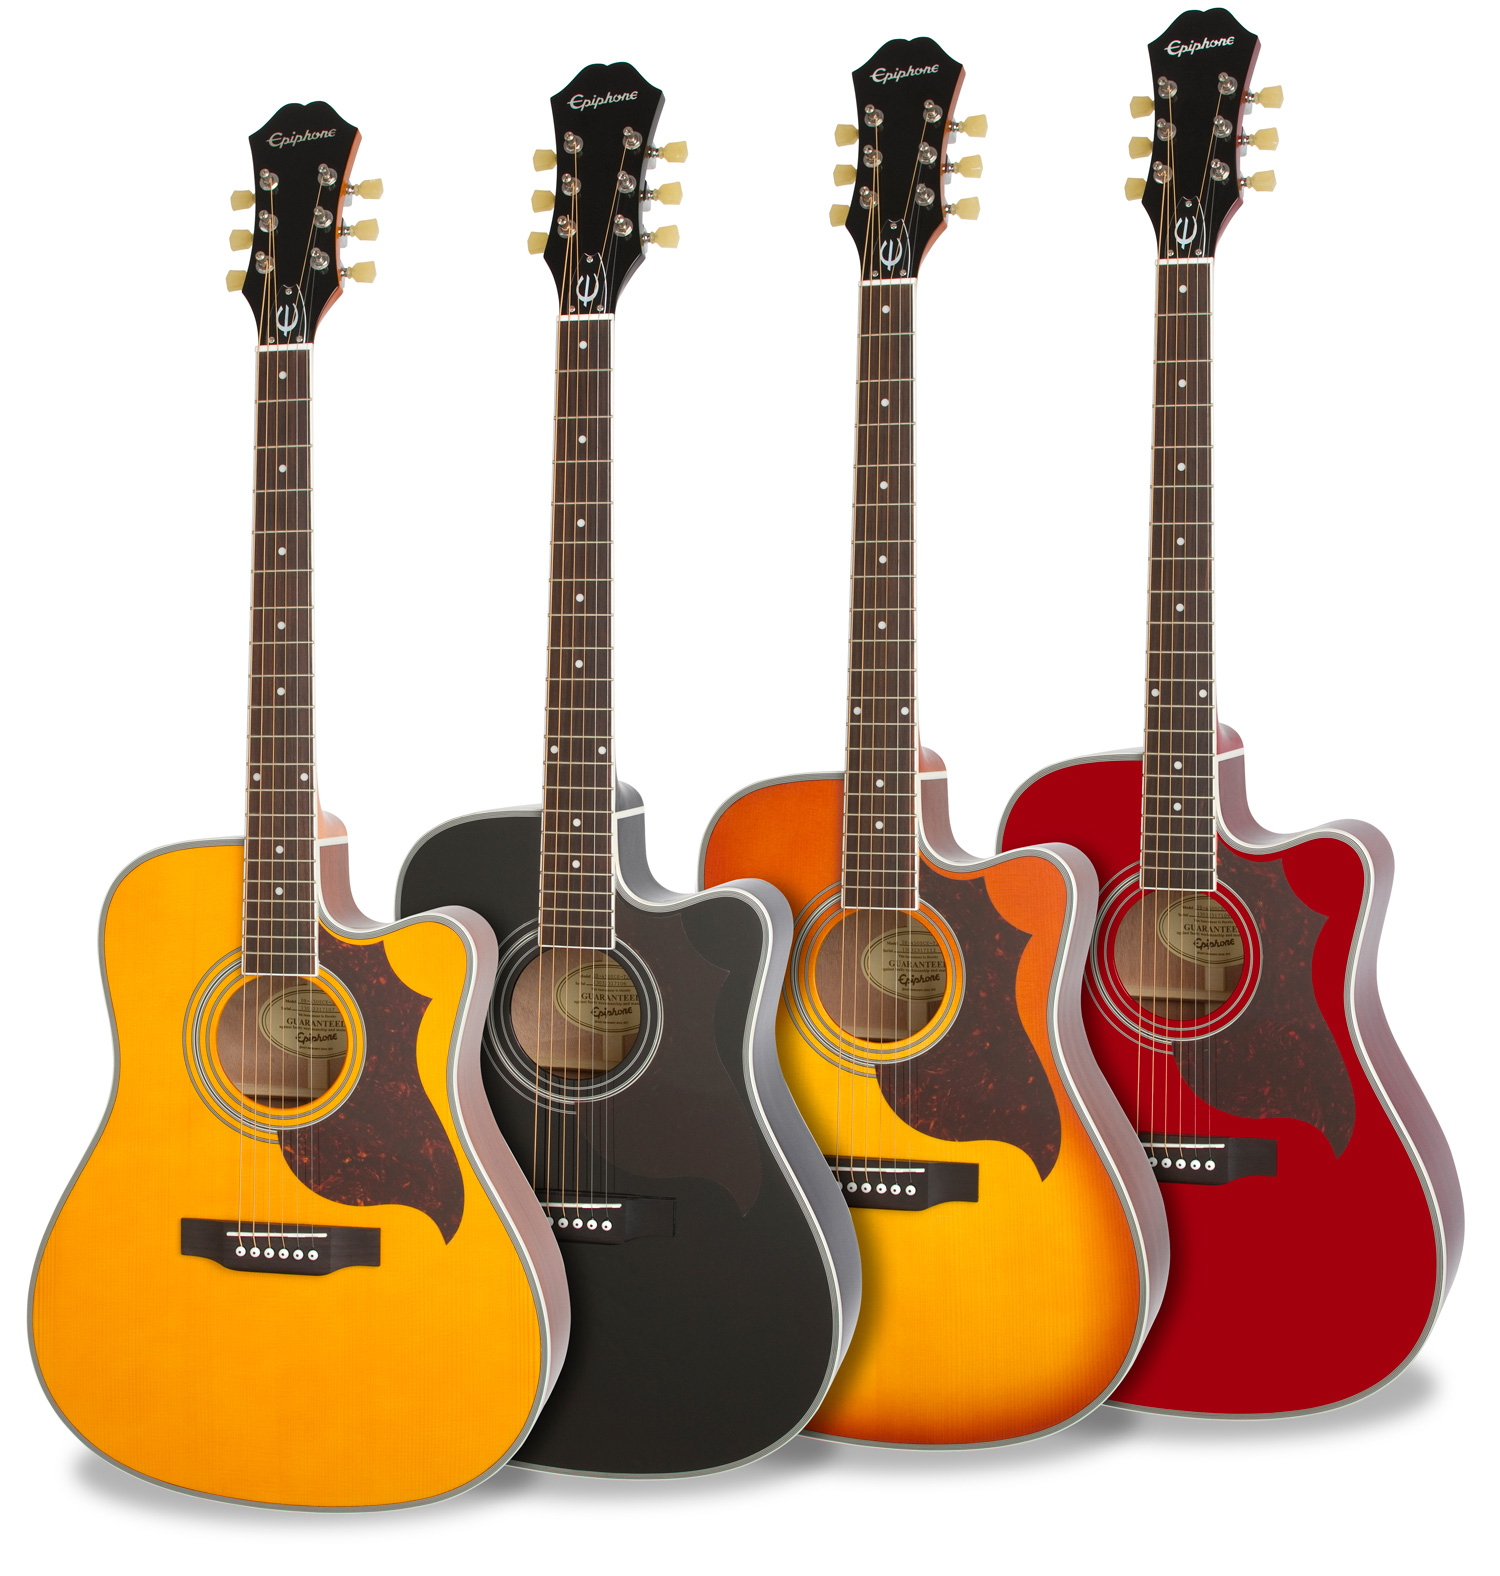 the min etune system mounted on epiphone guitars news audiofanzine. Black Bedroom Furniture Sets. Home Design Ideas